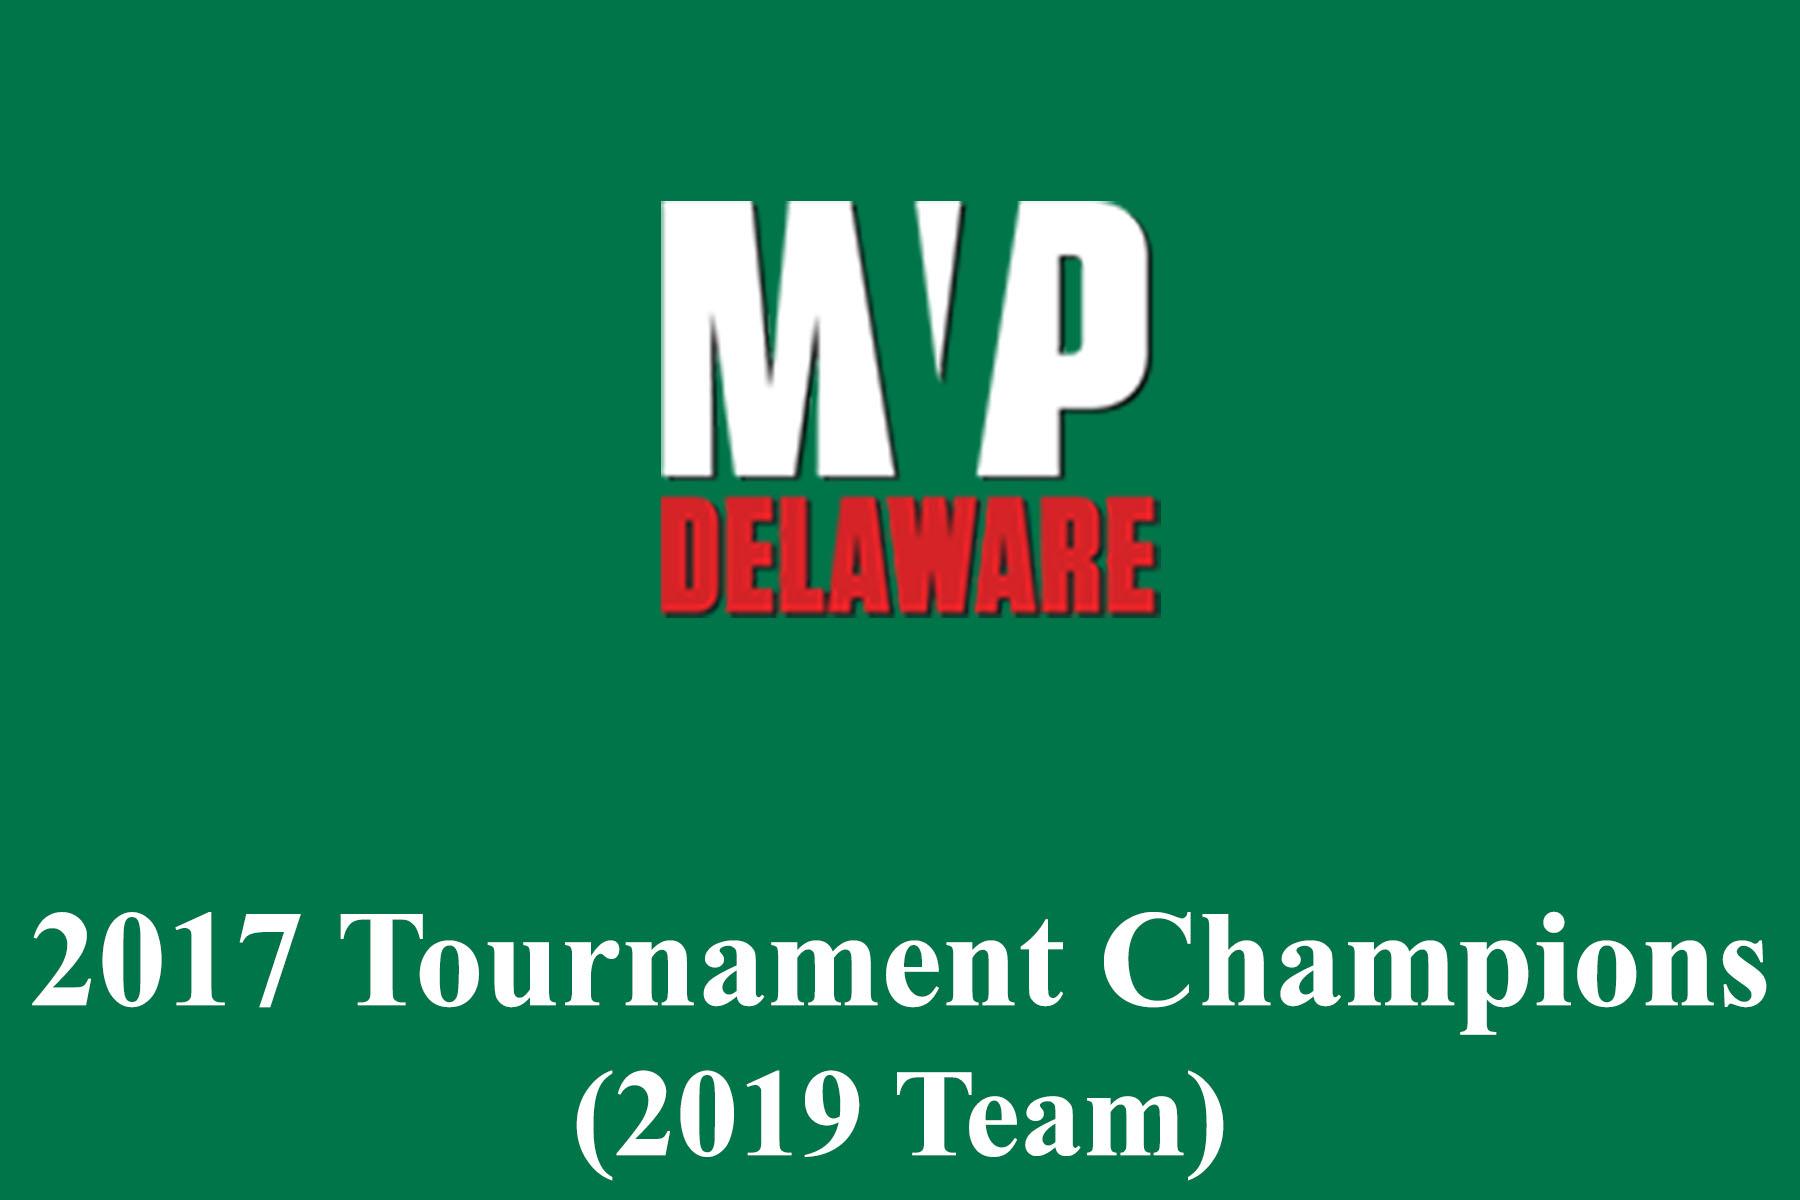 2017 champs mvp